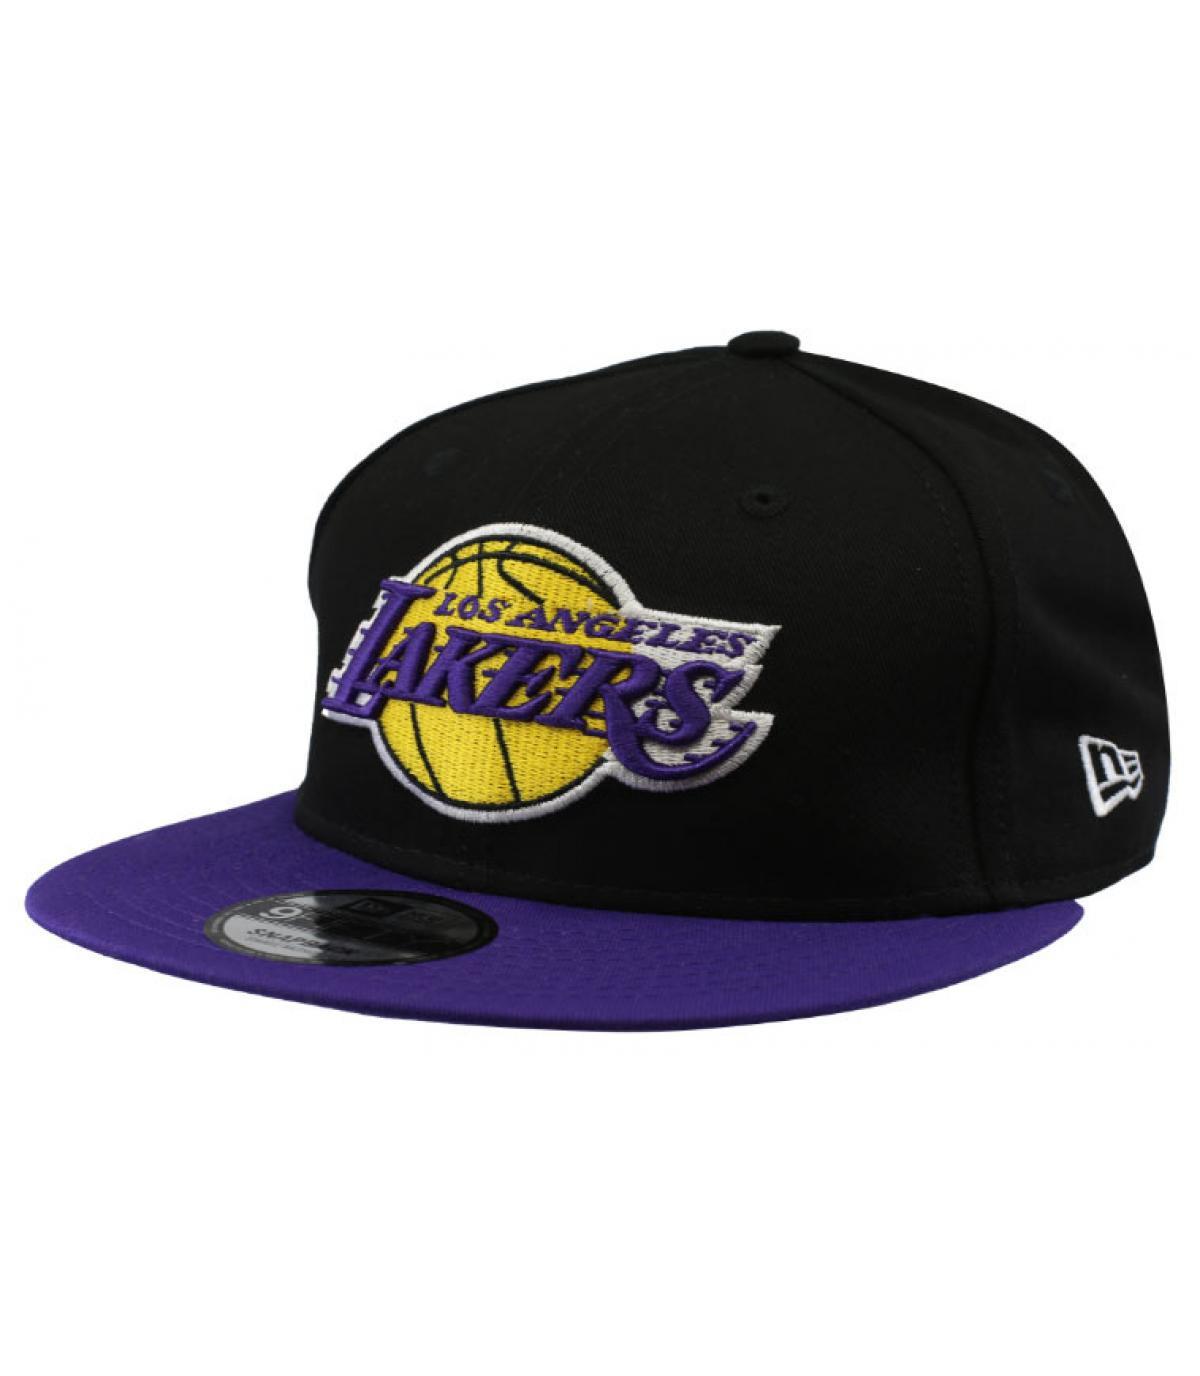 Détails NBA Lakers 9Fifty - image 2